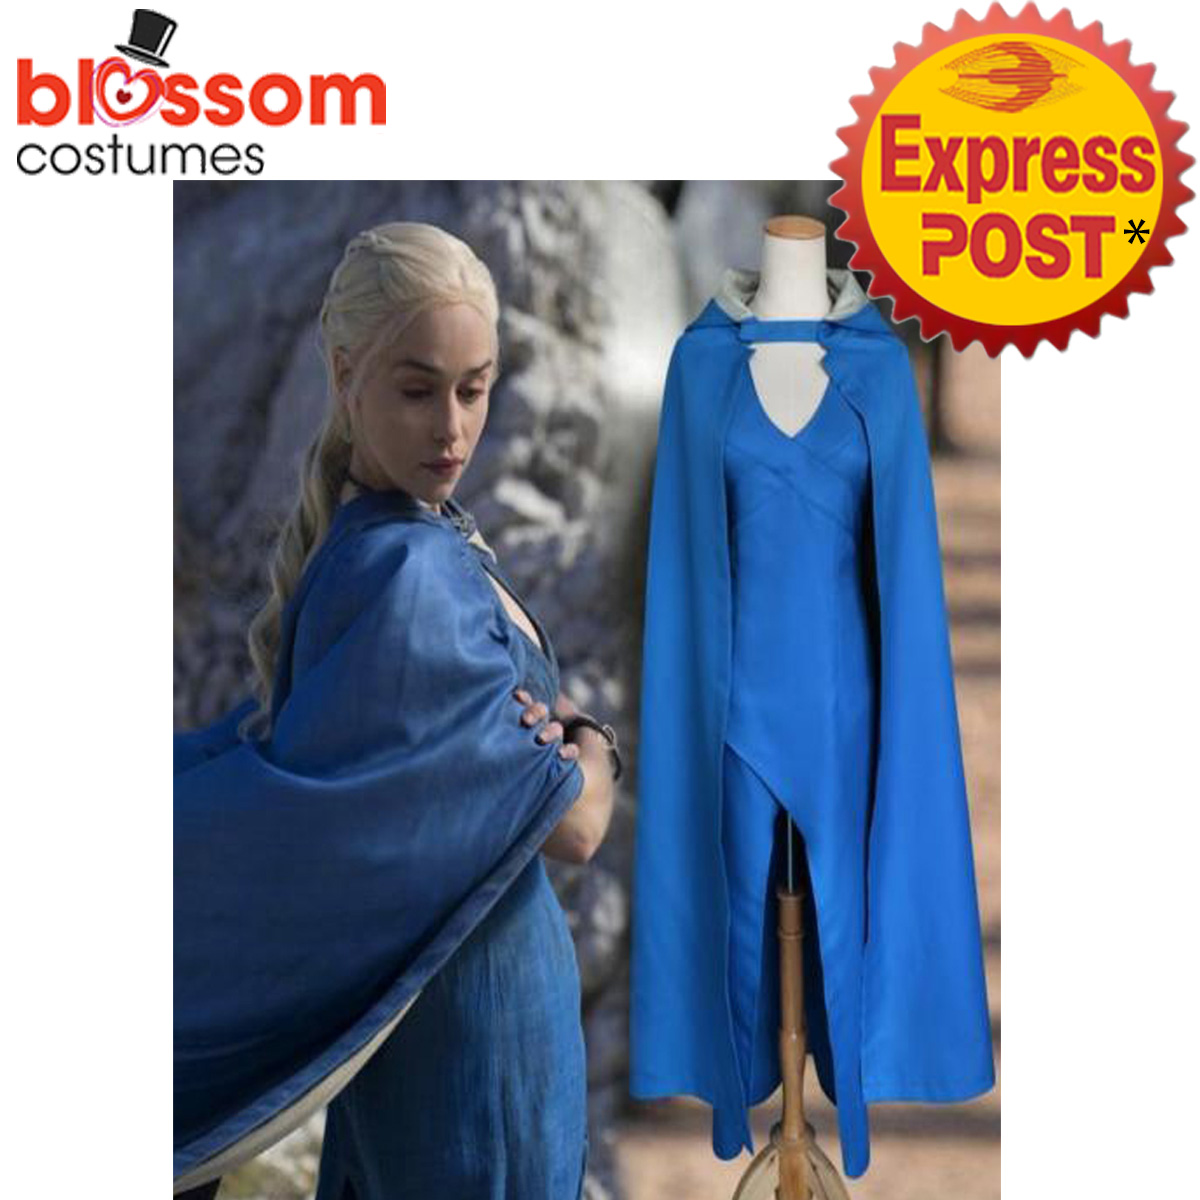 K367-Game-Of-Thrones-Khaleesi-Daenerys-Targaryen-Warrior-Queen-Halloween-Costume